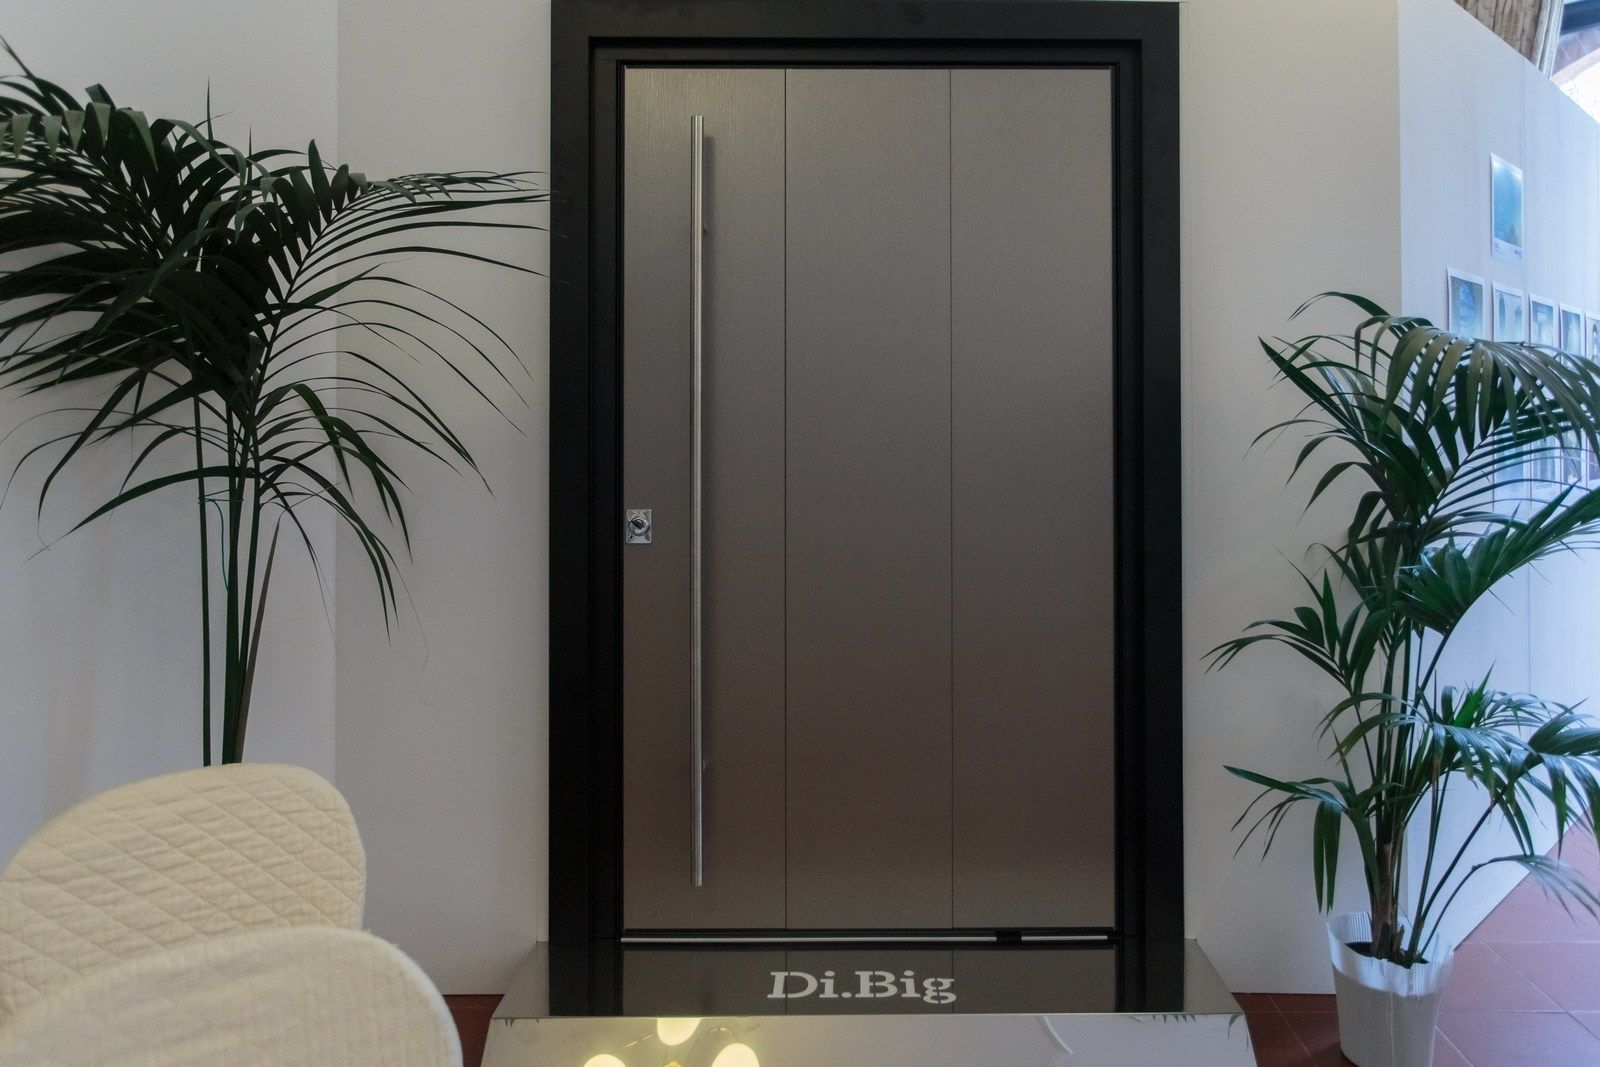 DI.BIG Puerta de entrada pivotante by DI.BI. PORTE BLINDATE | Home ...